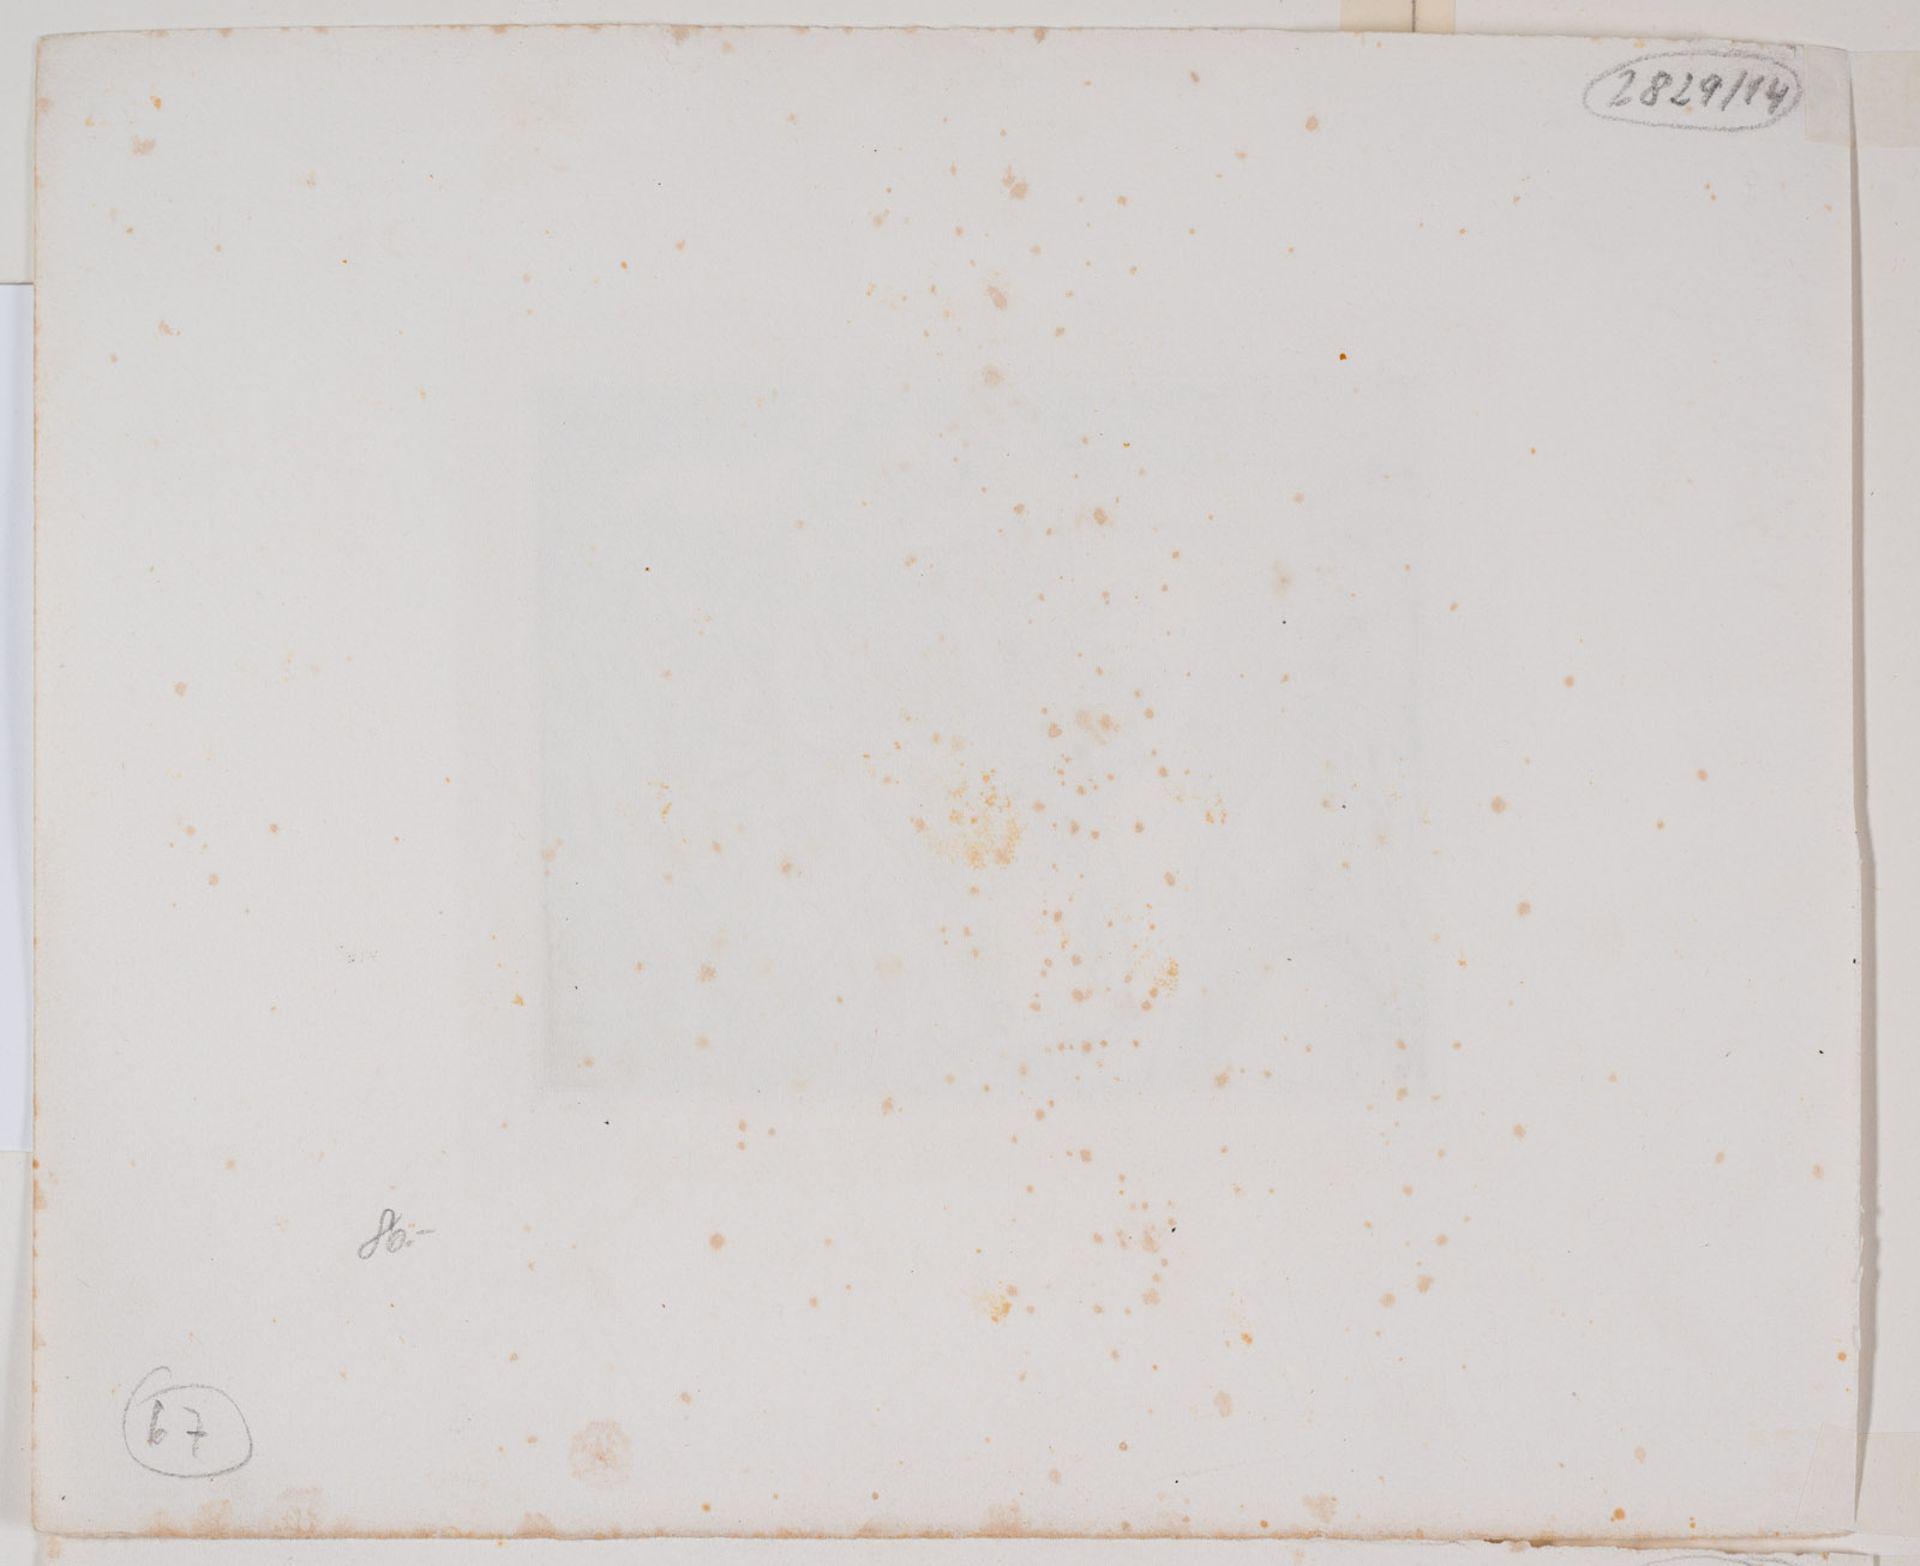 Geiger, Willi - Image 22 of 22